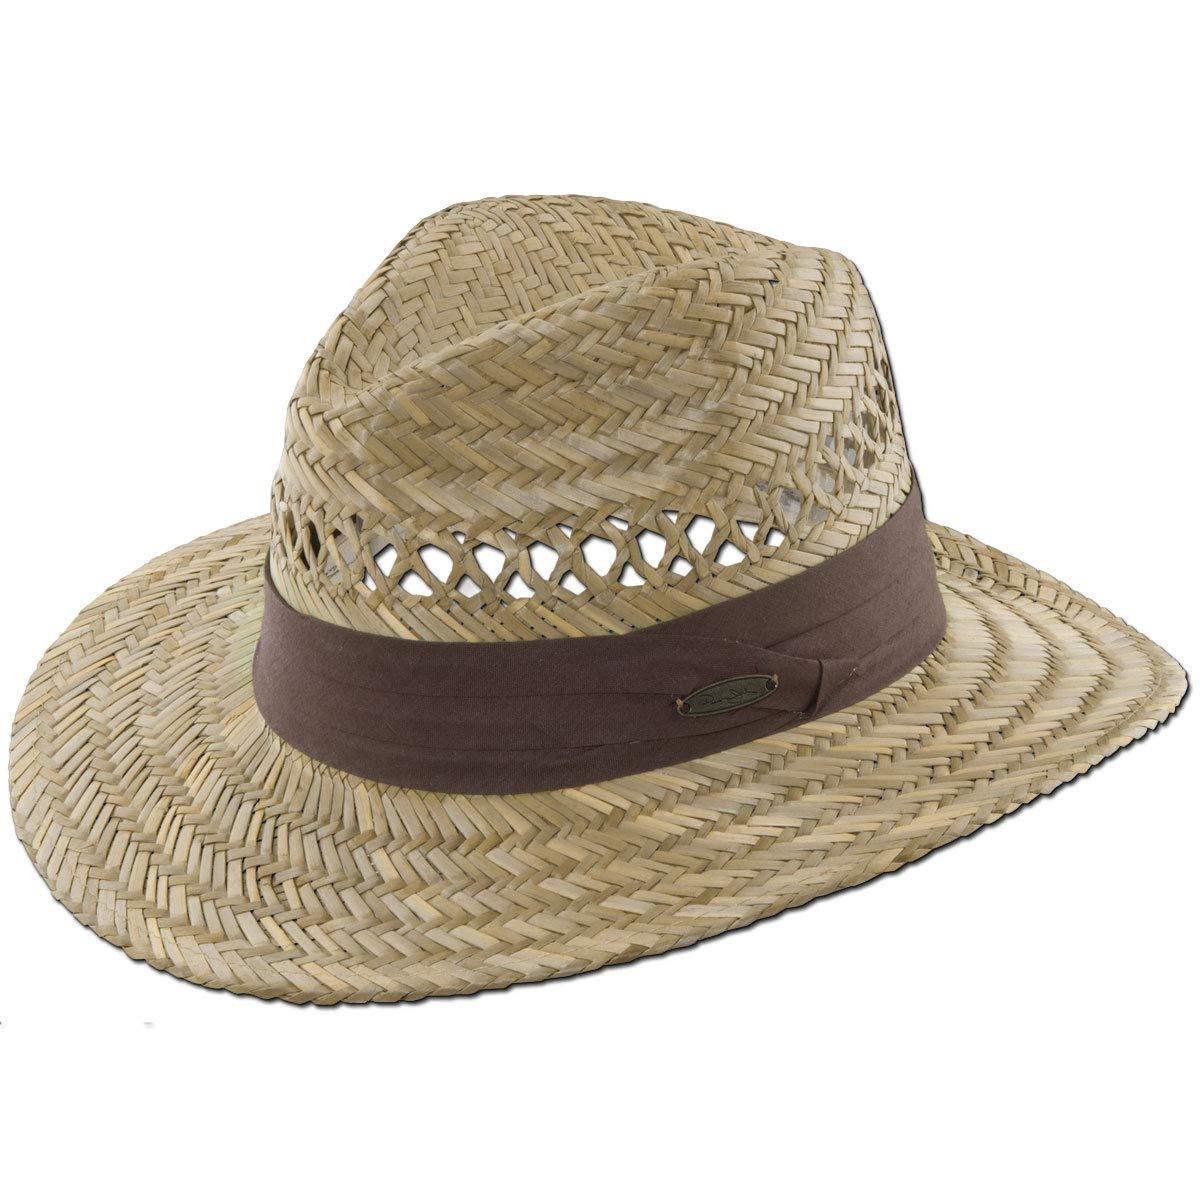 9d3bb637e Panama Jack Safari Straw Hat - Lightweight, 3